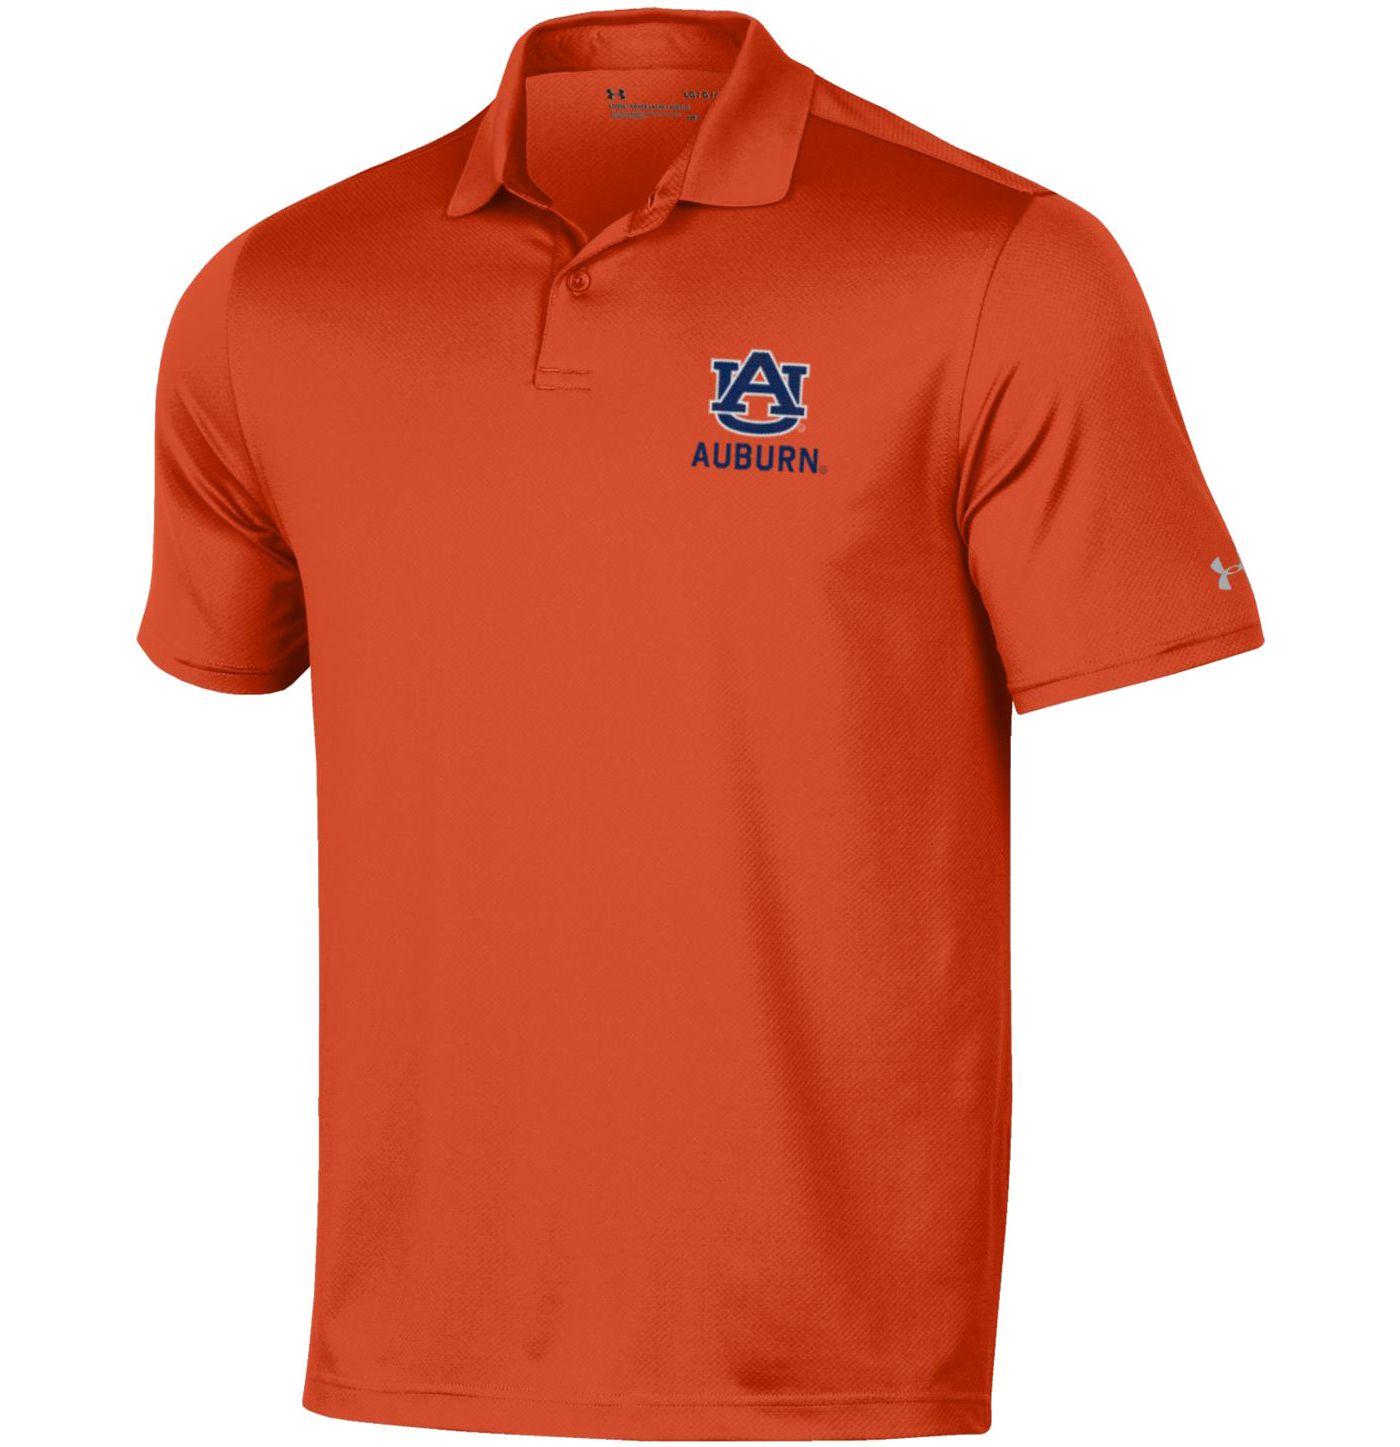 Under Armour Men's Auburn Tigers Orange Performance Polo